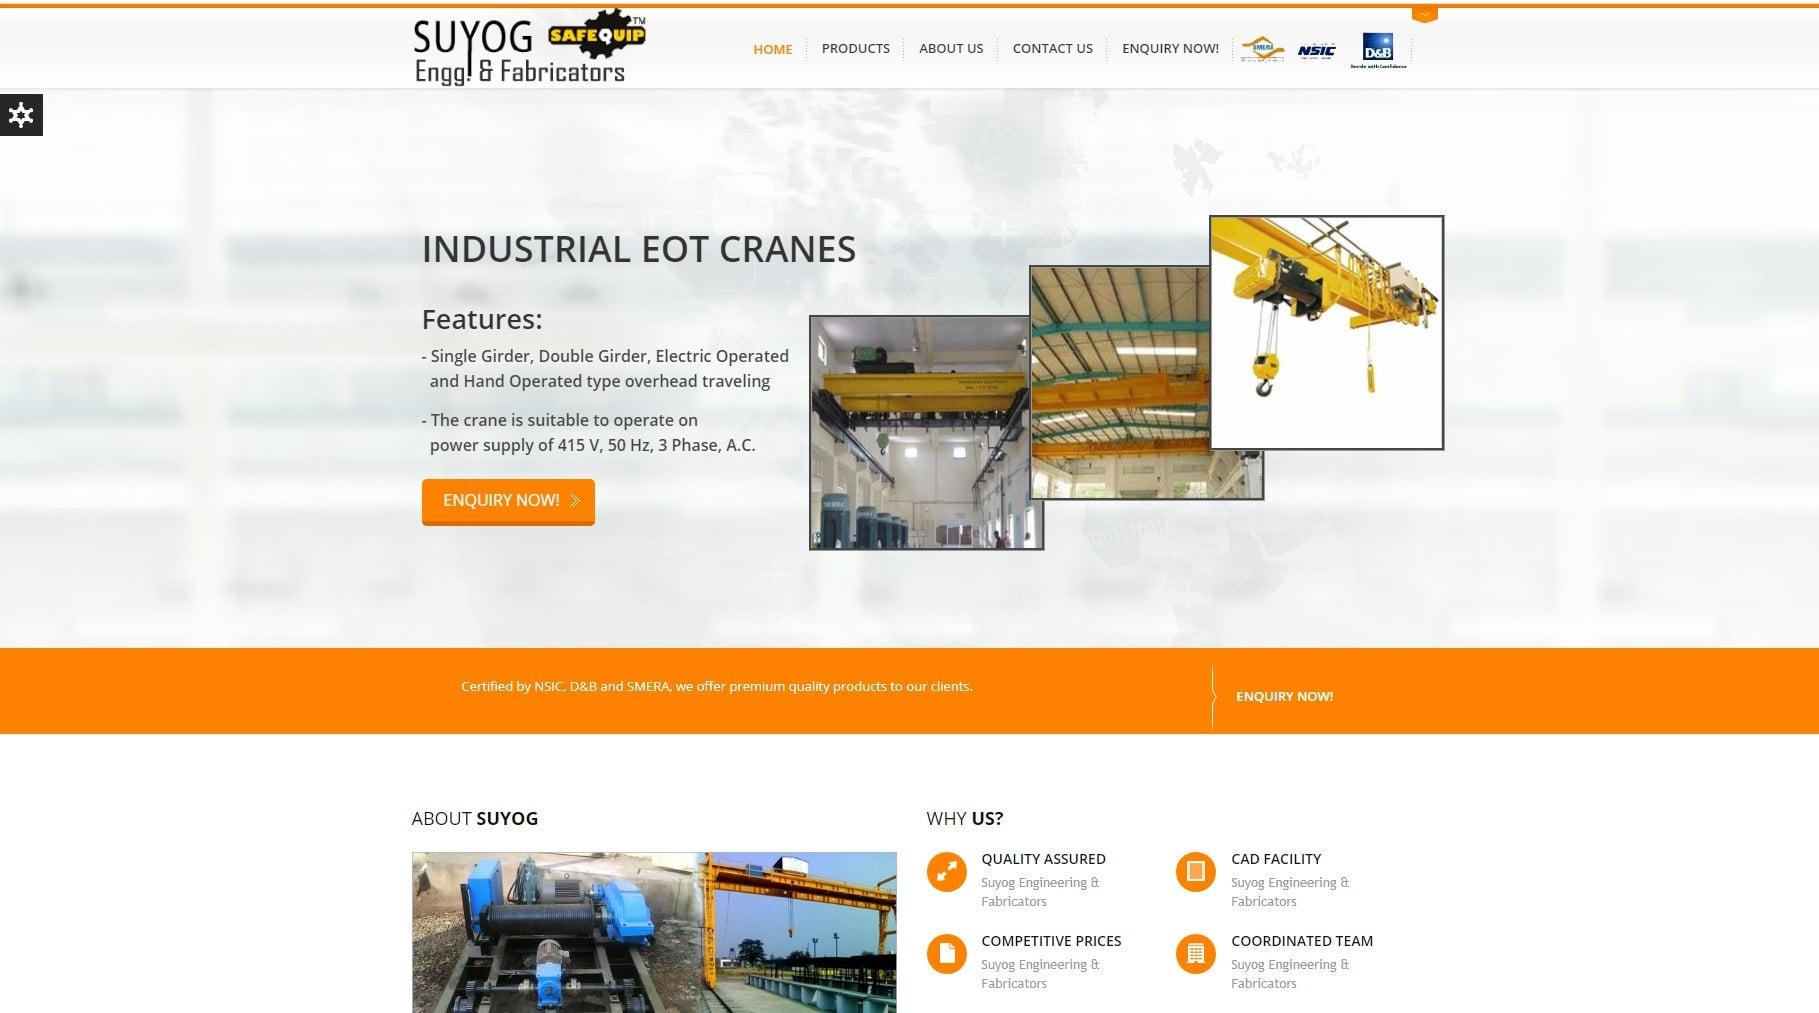 Suyog Engineering & Fabricators - Starland IT Solution